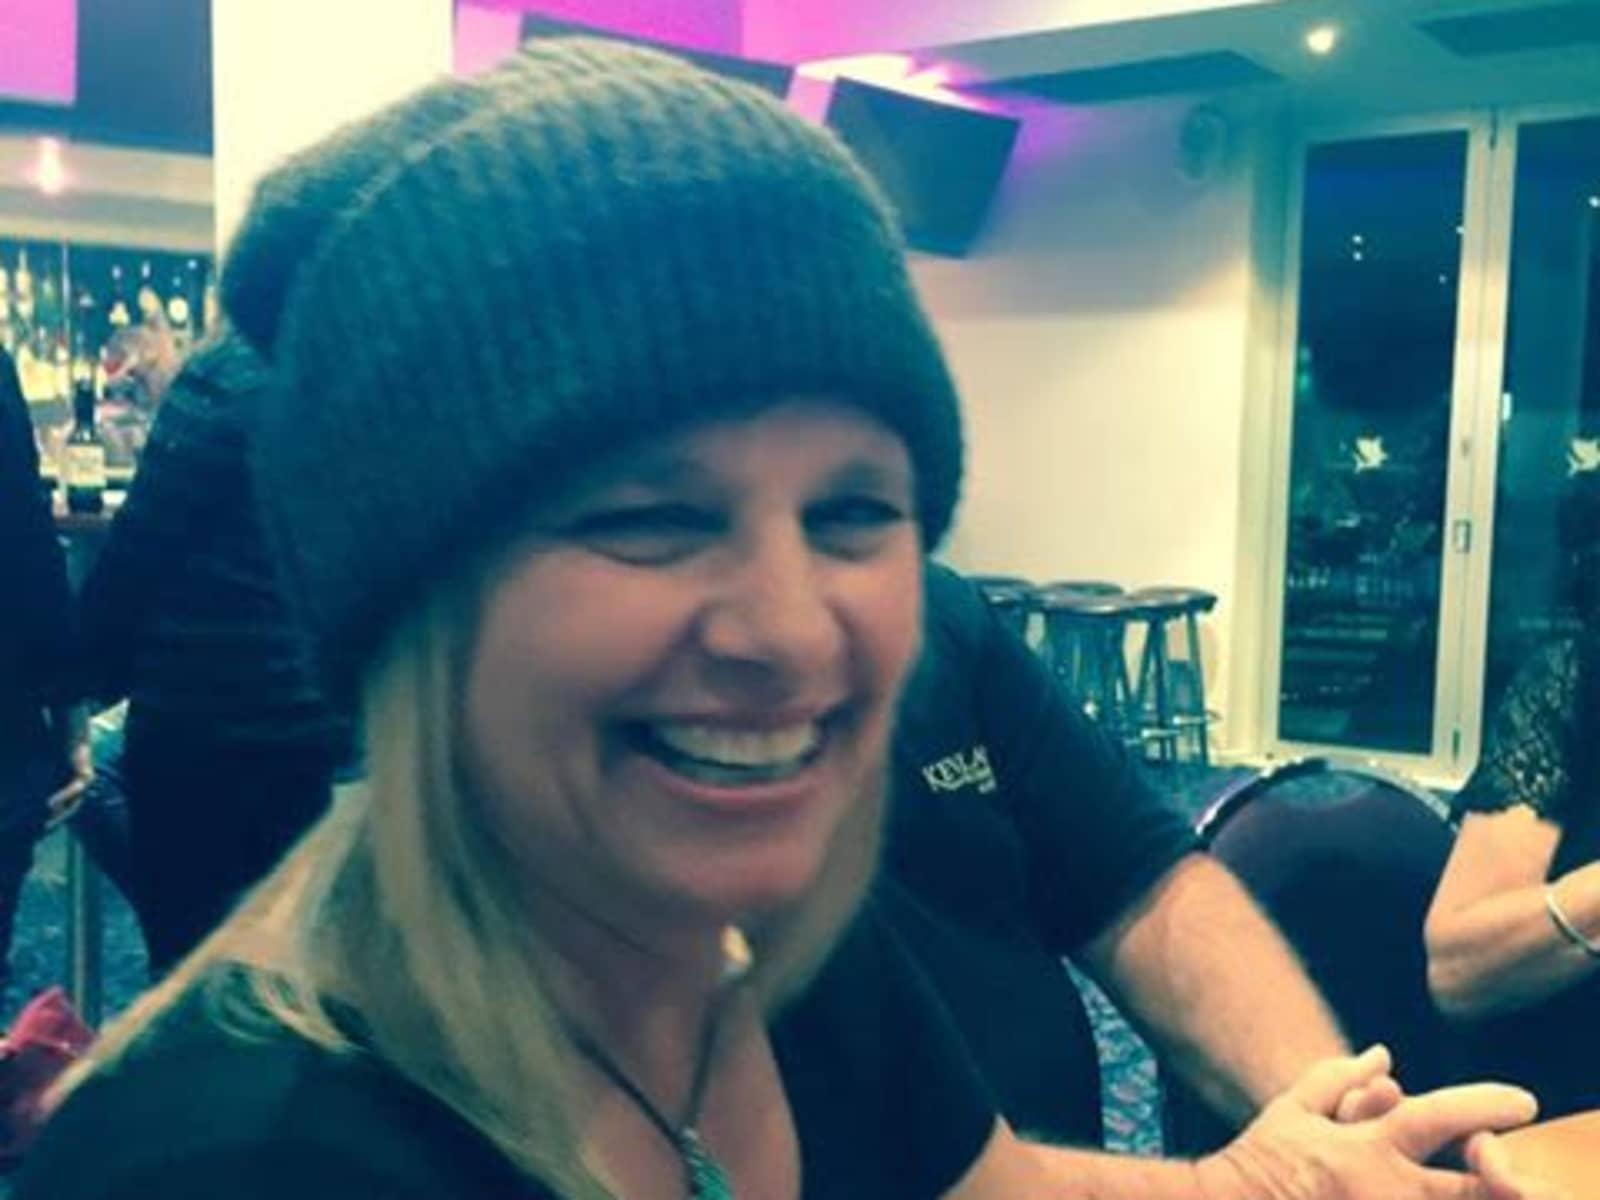 Robyn from Gold Coast, Queensland, Australia